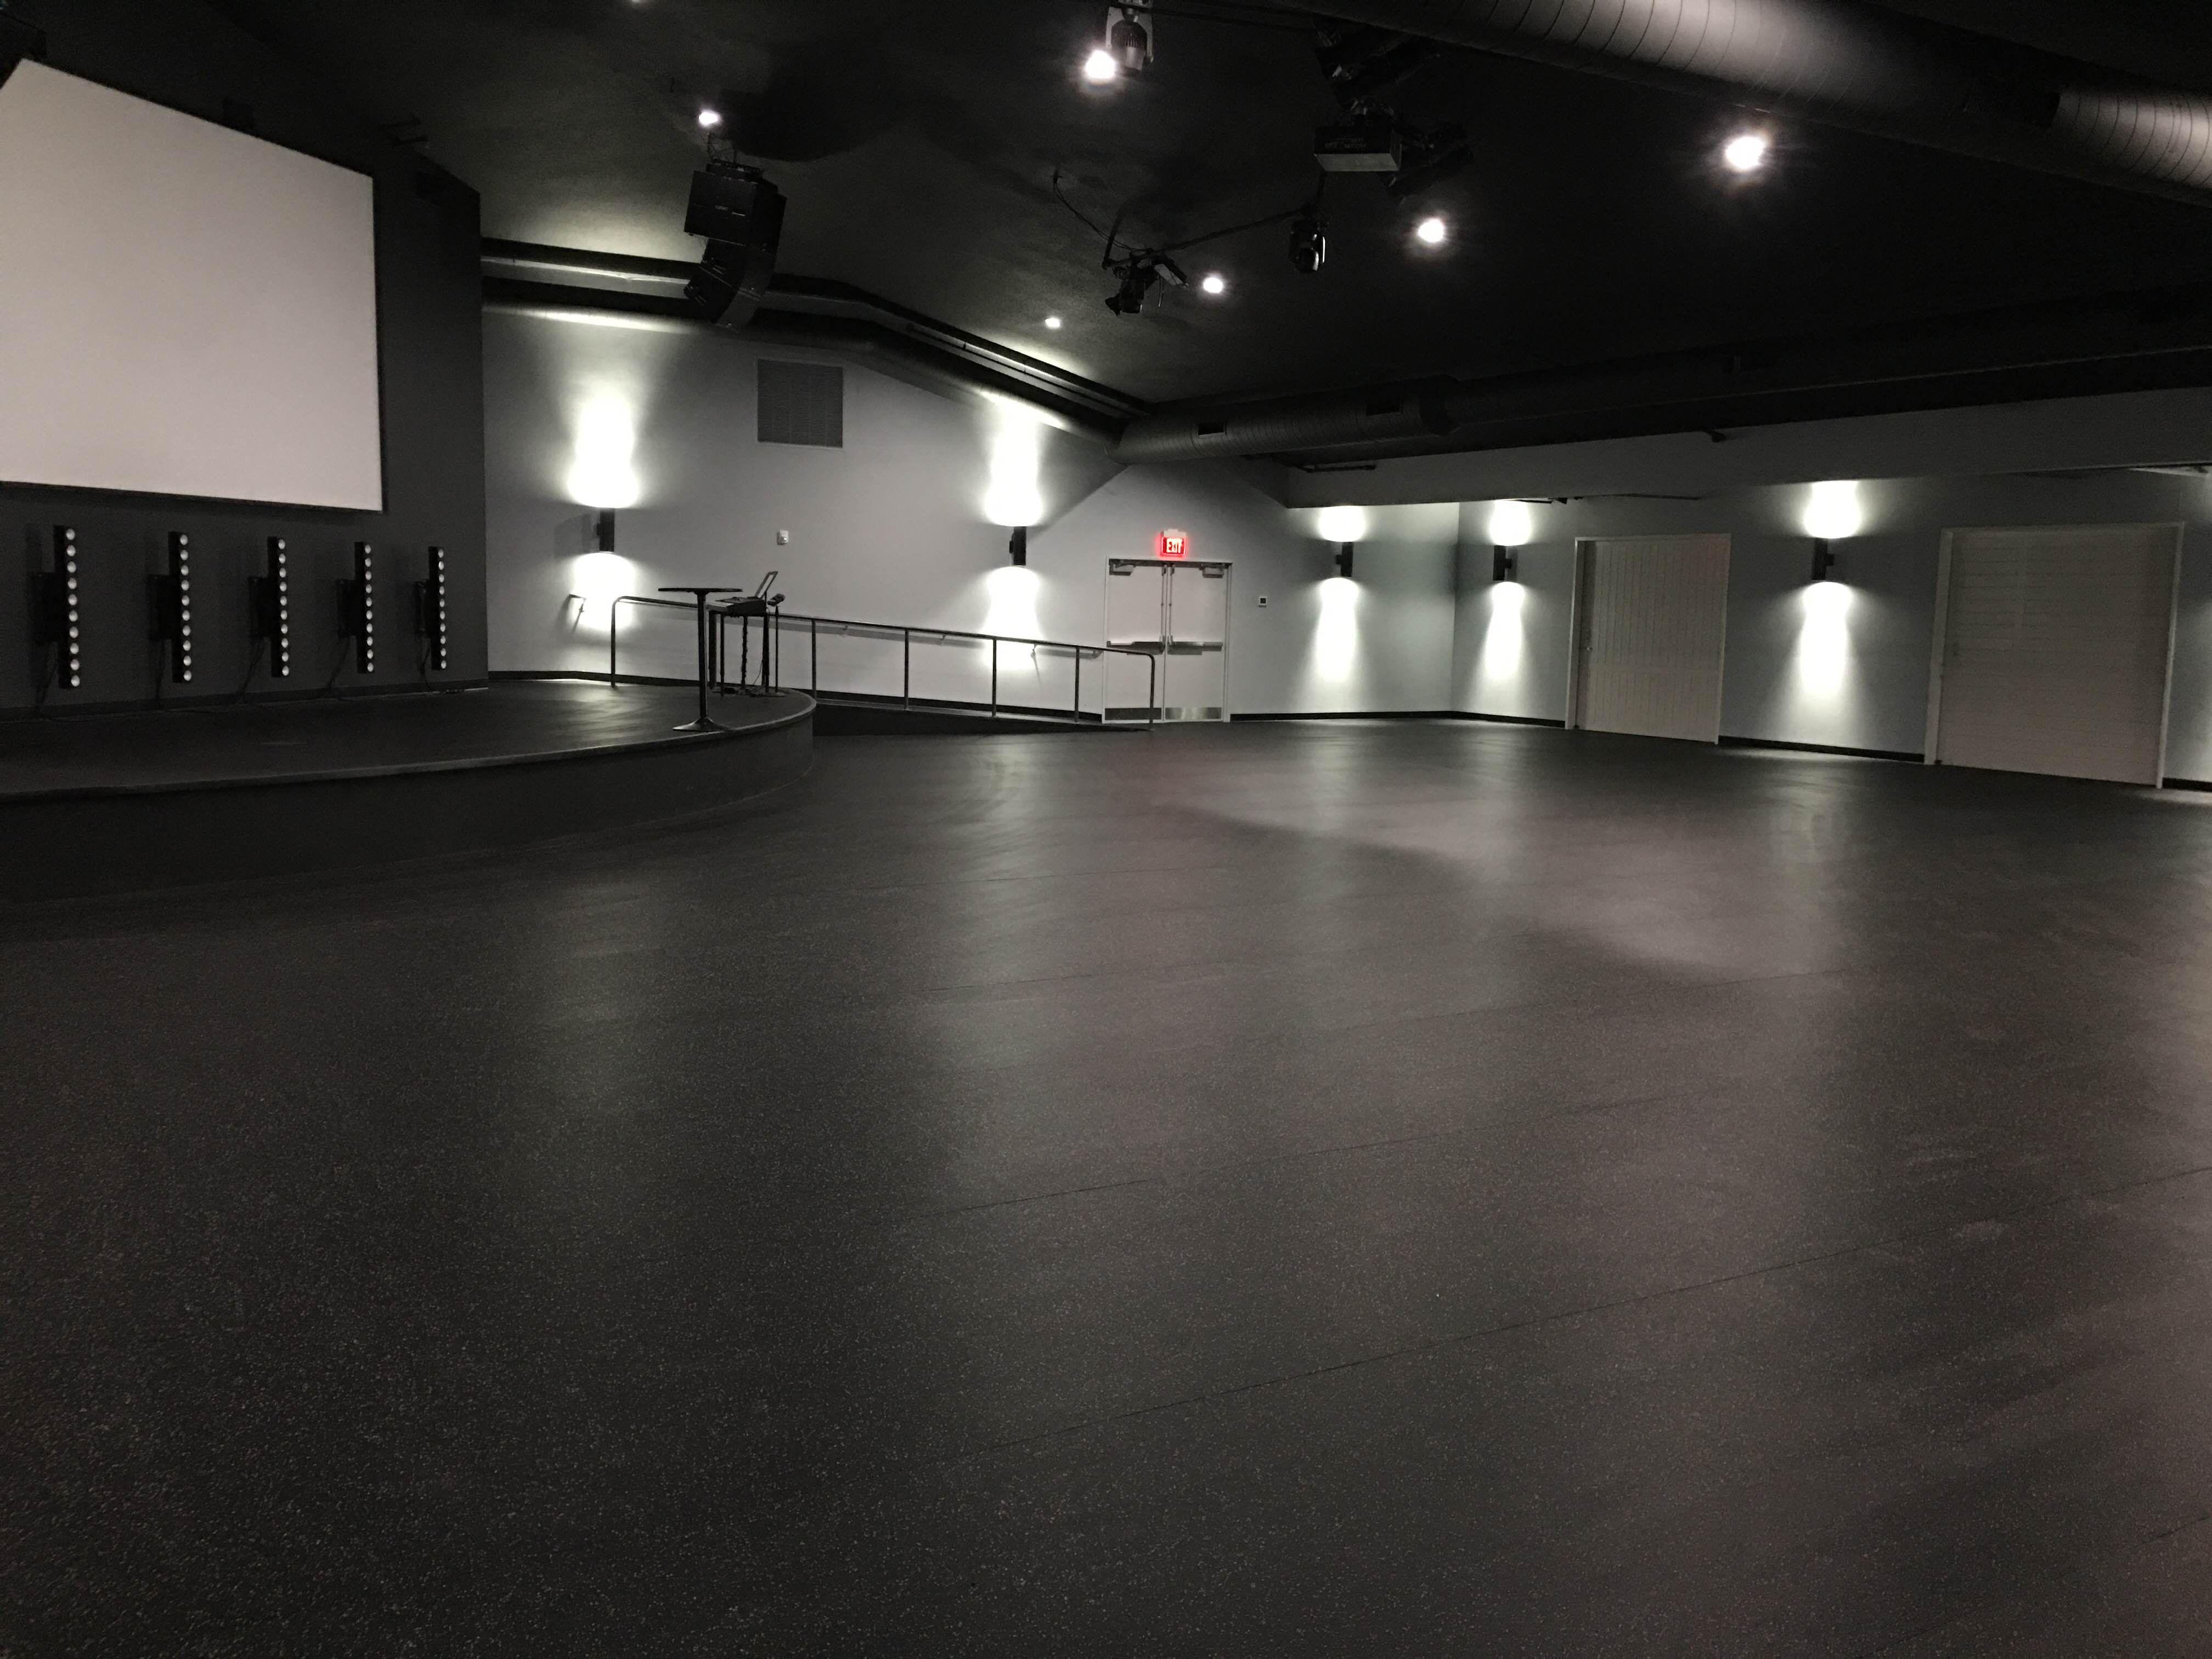 Wholesale Durable Gym Industrial Rubber Mats Flooring Rolls Gym Flooring Rubber Rolled Rubber Flooring Rubber Floor Mats